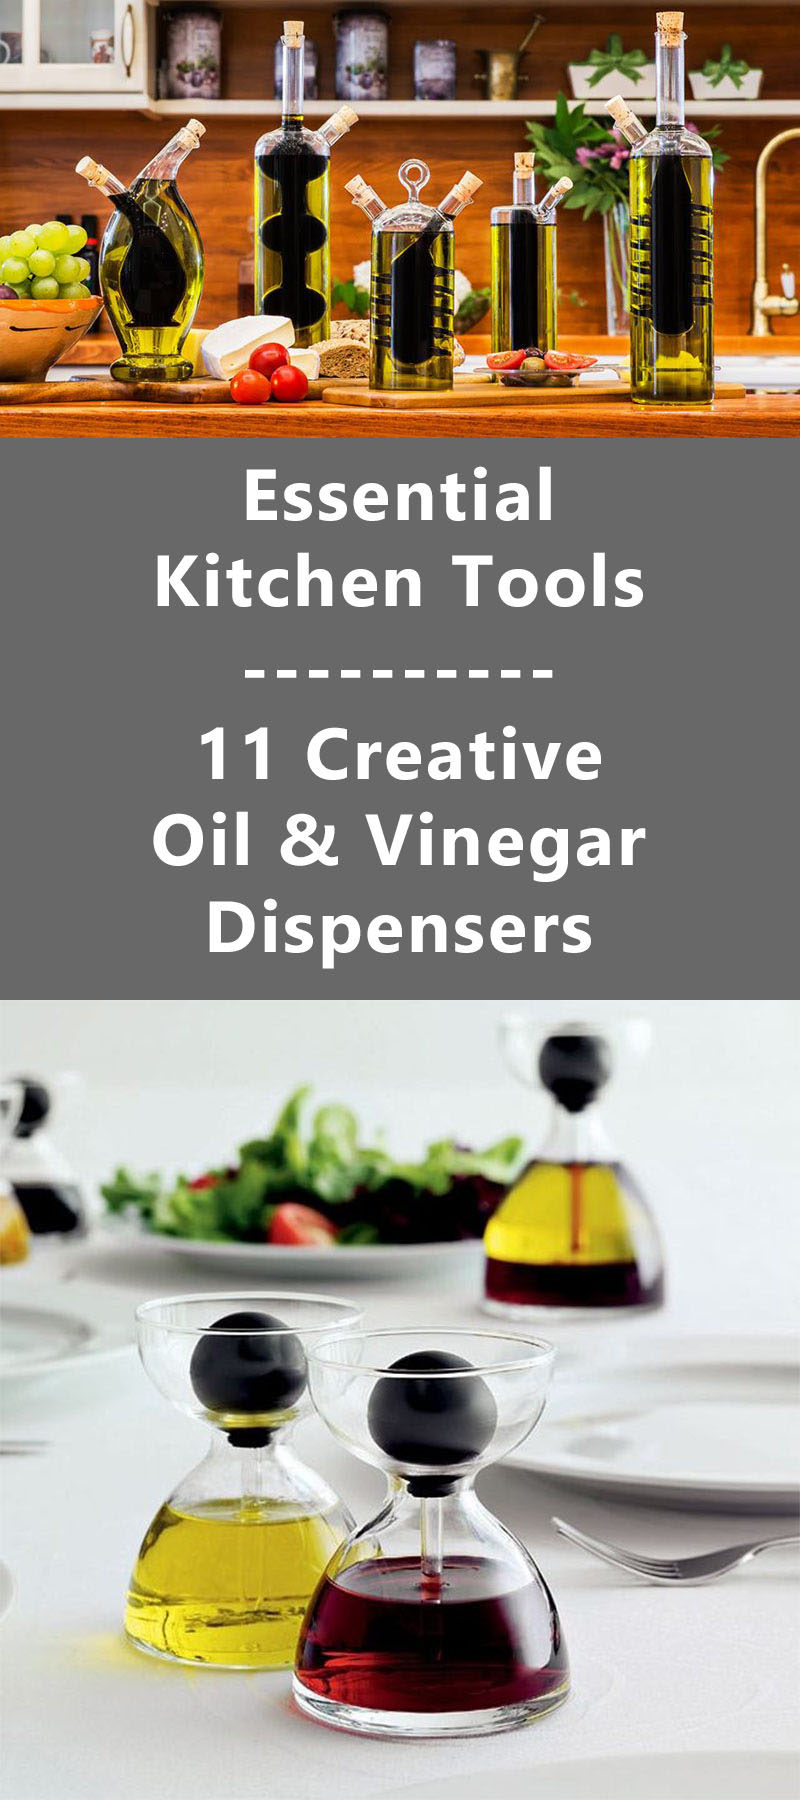 Essential Kitchen Tools - 11 Creative Oil & Vinegar Dispensers